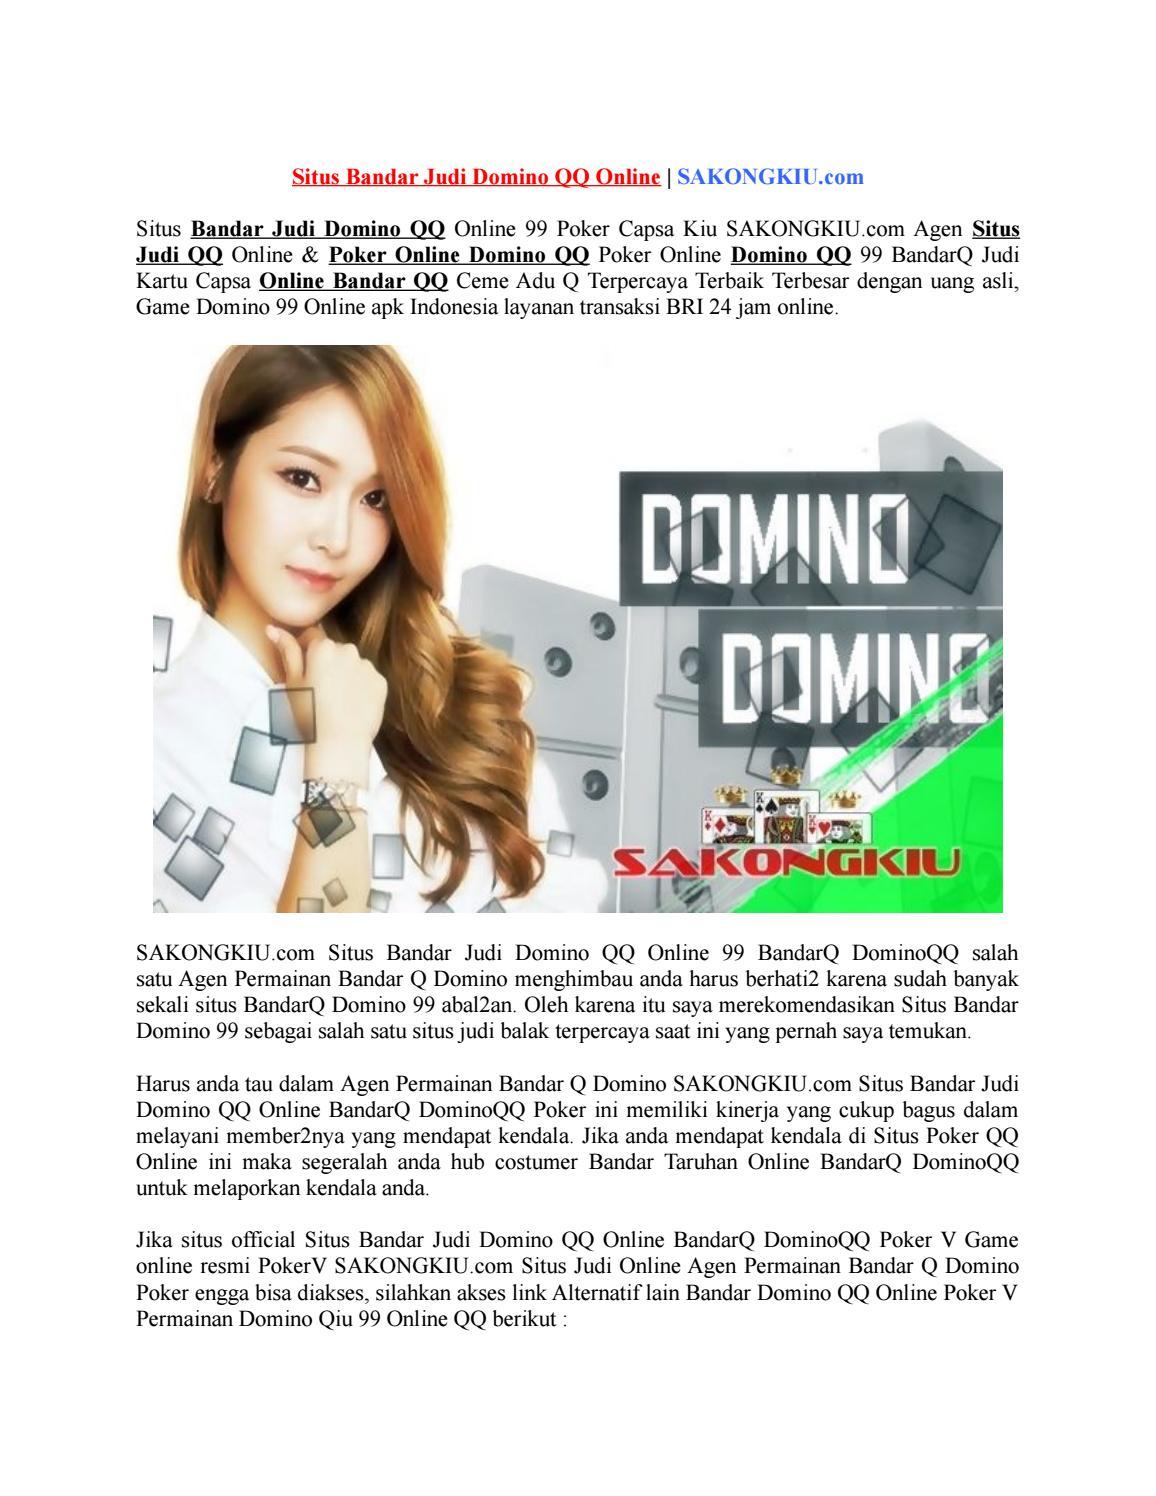 Situs Bandar Judi Domino Qq Online Sakongkiu Com By Una Luna Issuu